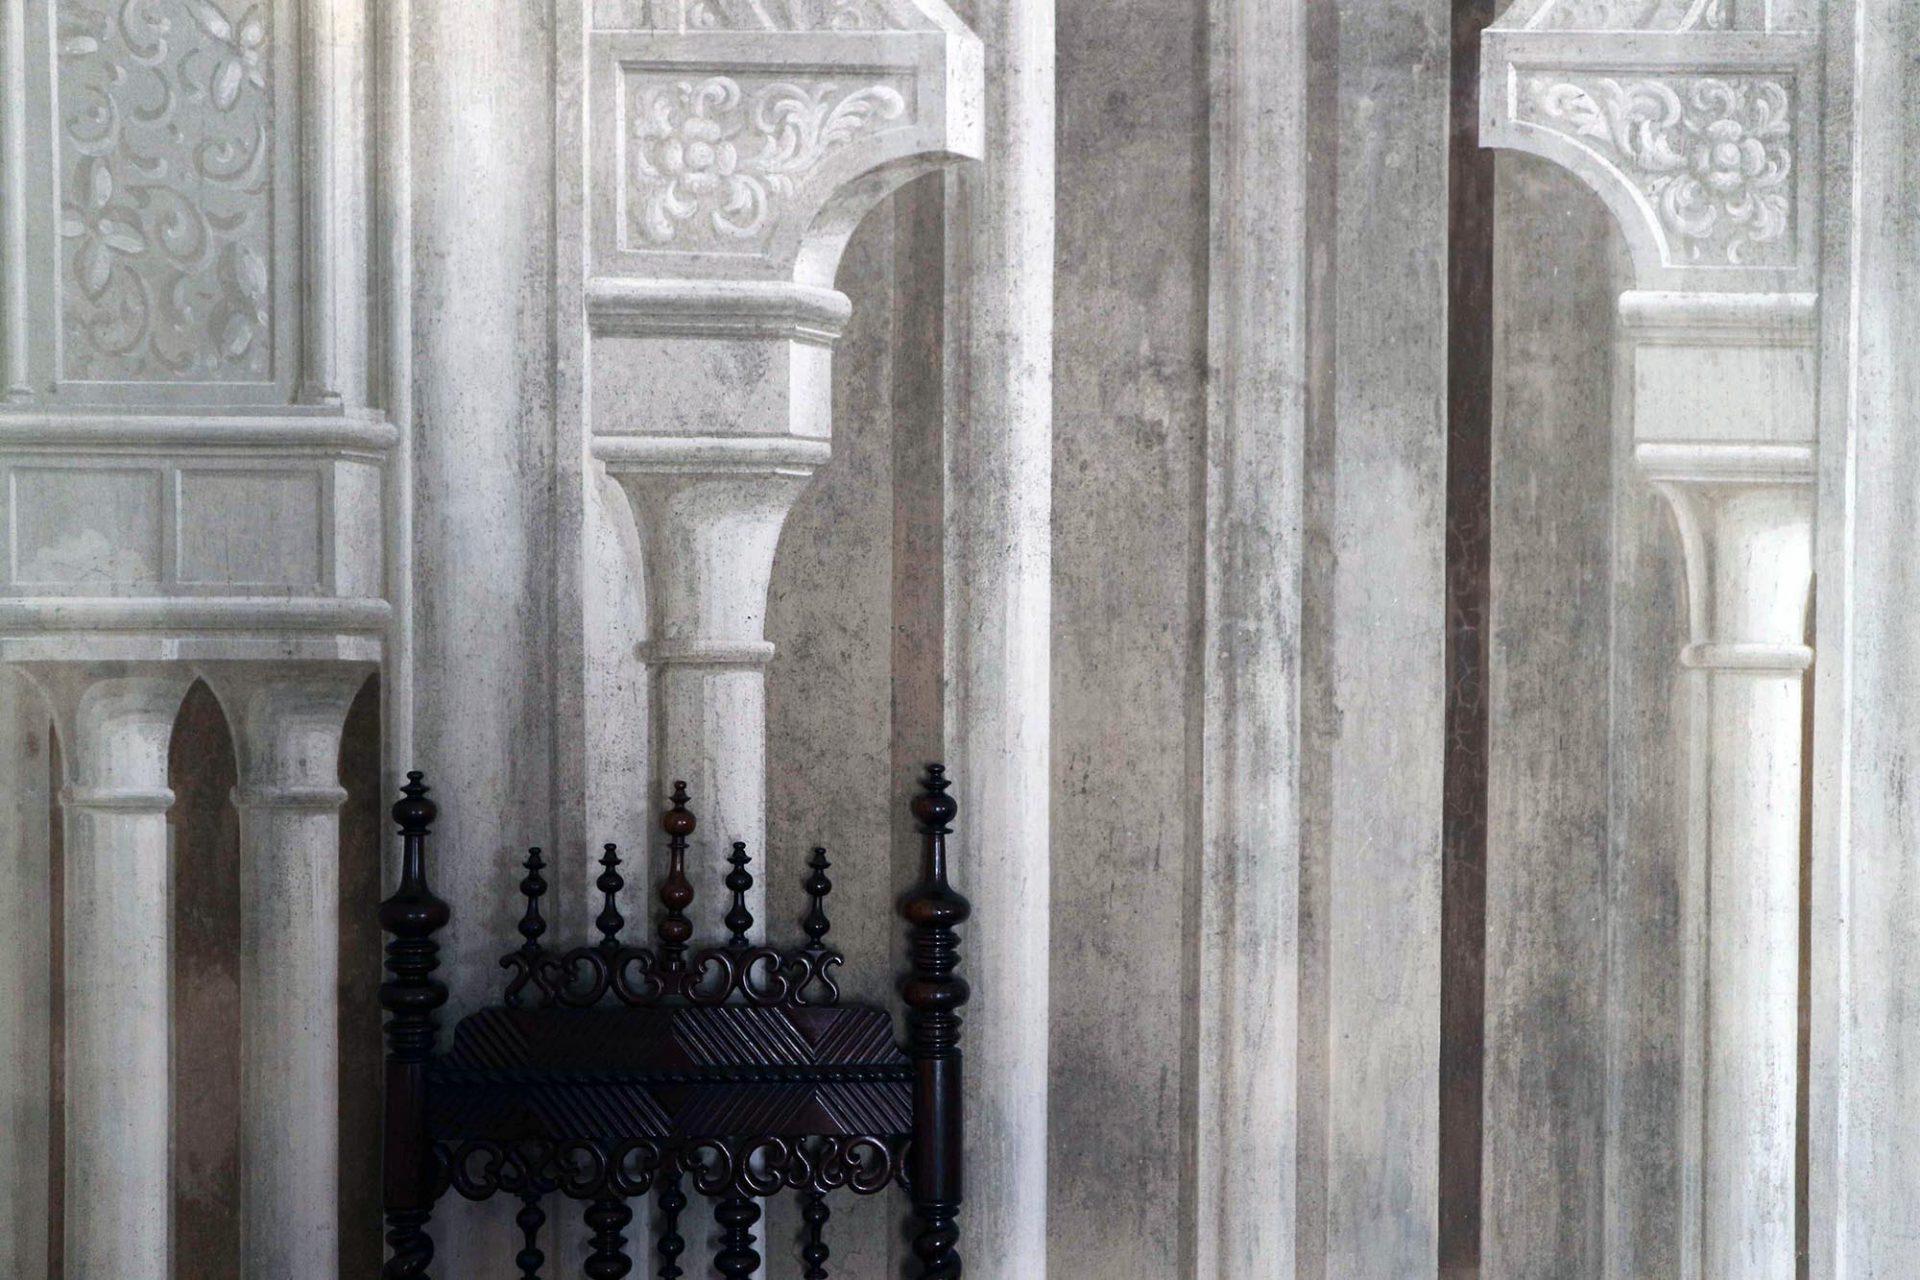 Palácio Nacional da Pena.  Aufwendiger Wandschmuck im Inneren.